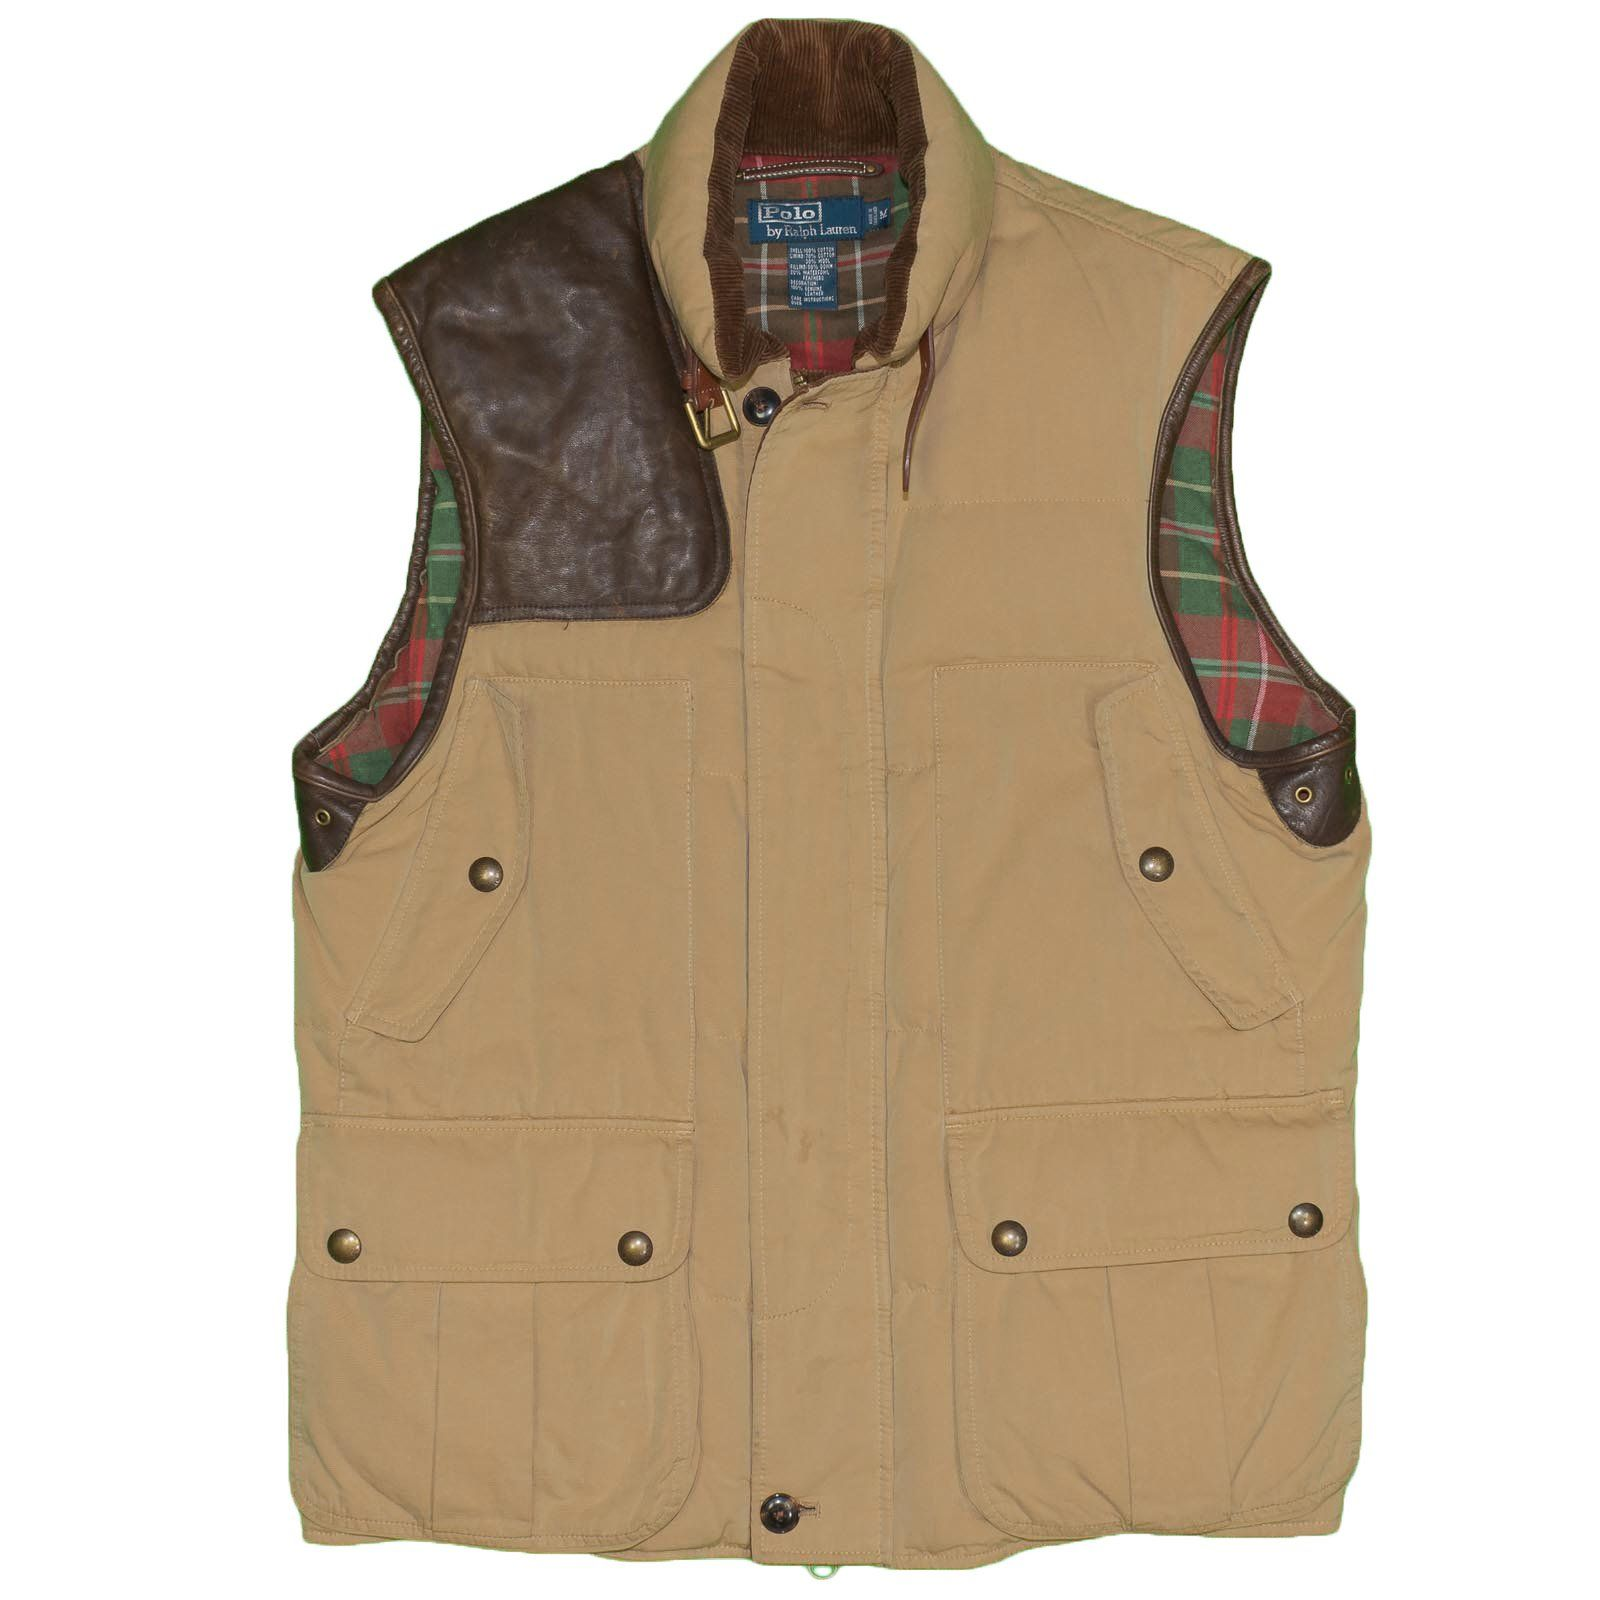 cb38904ce07ff Polo Ralph Lauren Men's Vest Jacket Medium Leather Down Insulated Spor –  itisvintage #itisvintage #hunting #shooting #sportsman #workwear #polo # ralphlauren ...